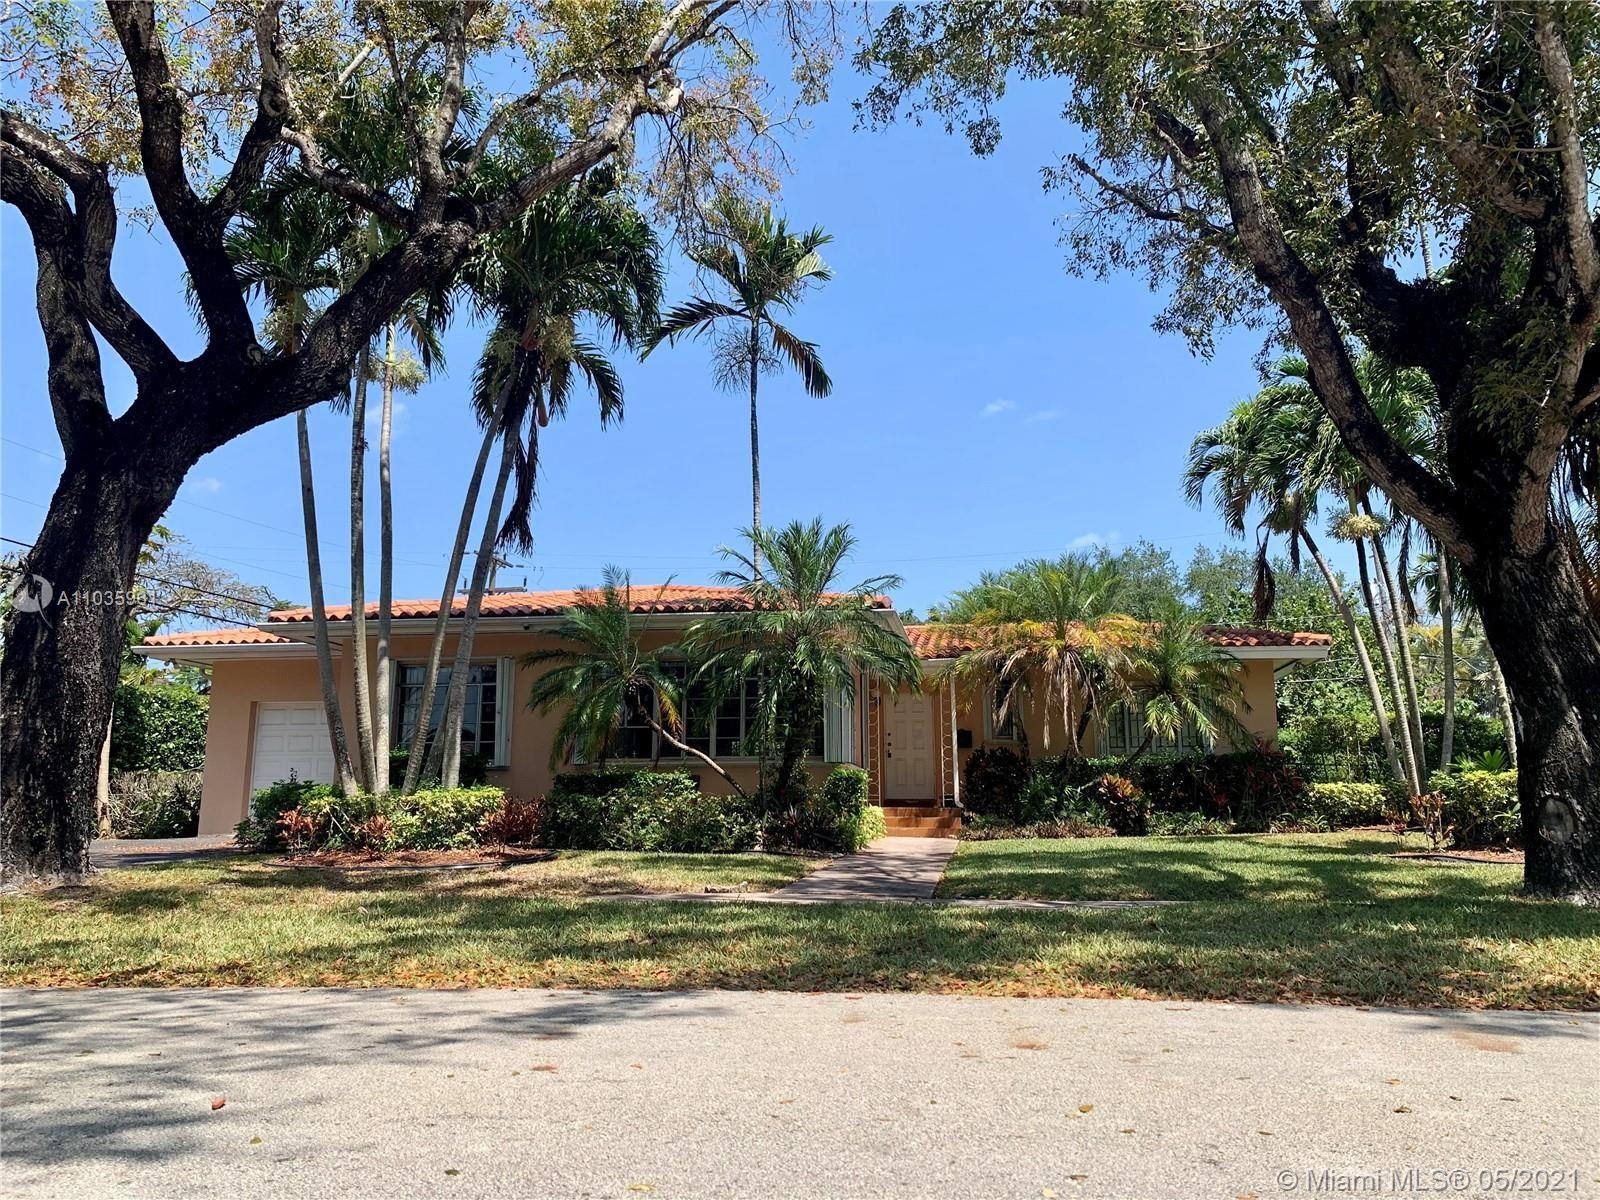 1535 Certosa Ave, Coral Gables, FL 33146 - #: A11035961